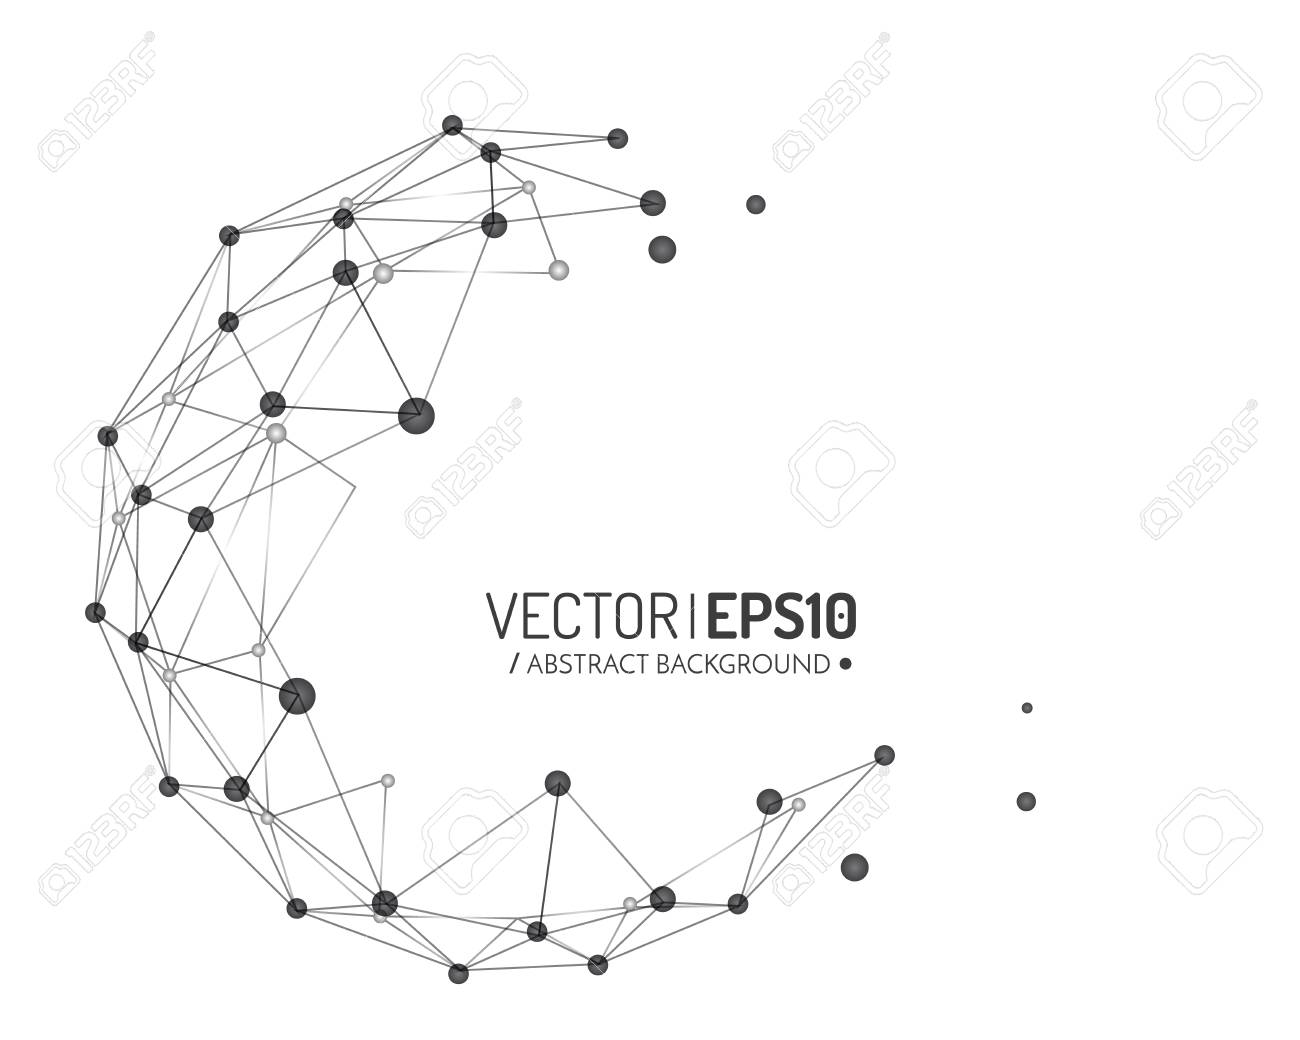 3d geometric vector design for business or science presentation. Vector illustration - 68972771